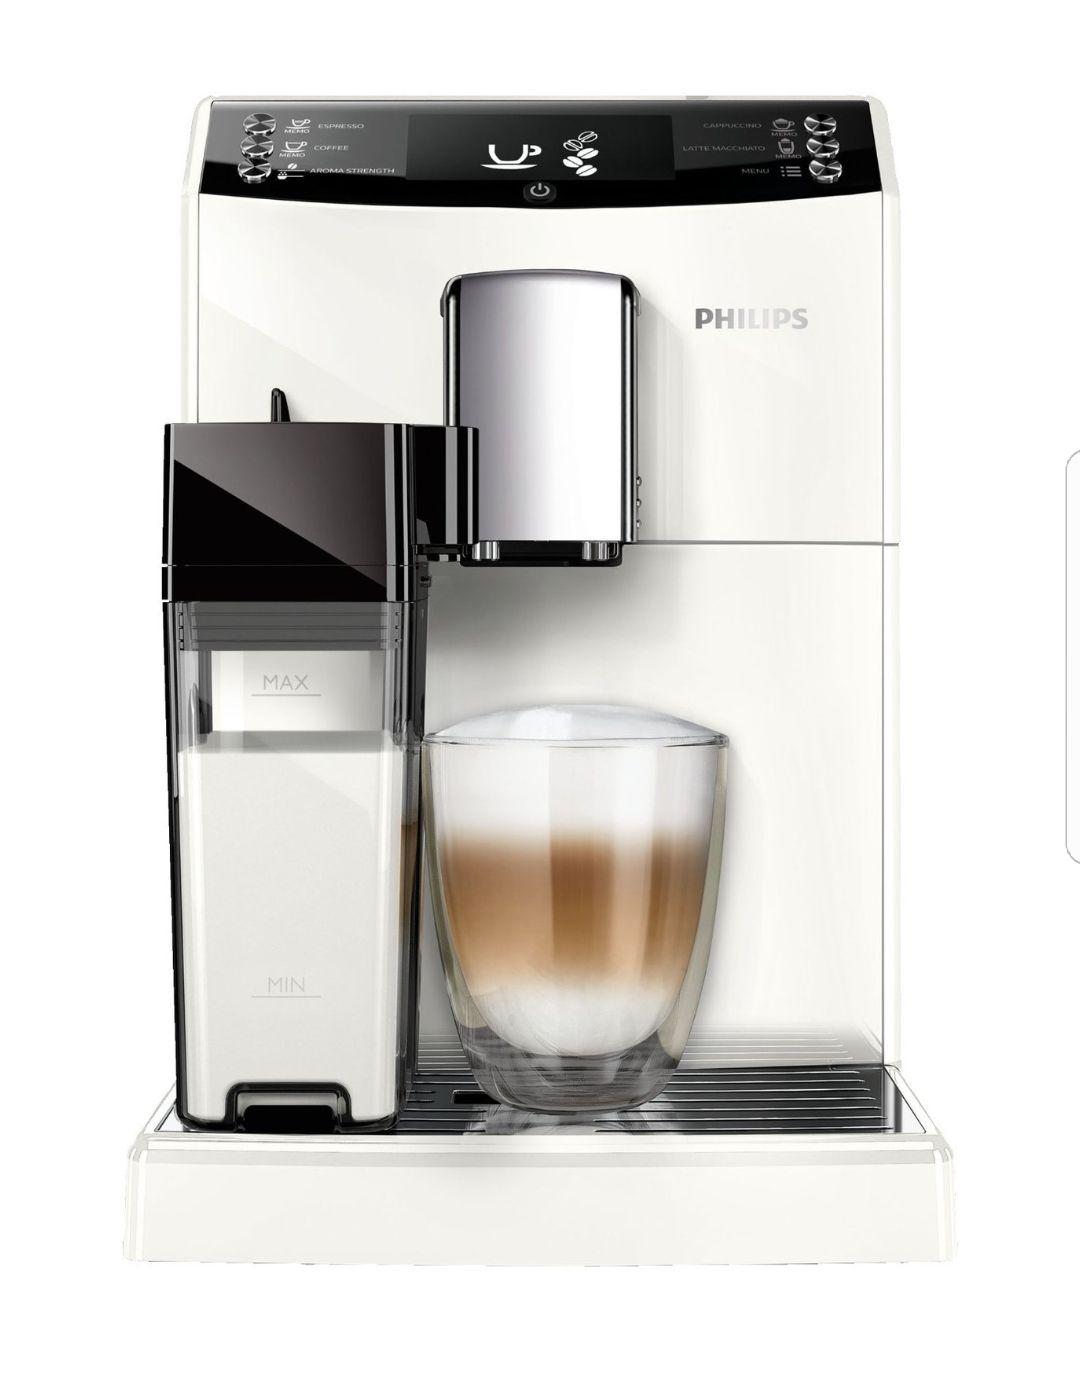 philips ep3362 00 70 geschenkset gratis kaffee. Black Bedroom Furniture Sets. Home Design Ideas